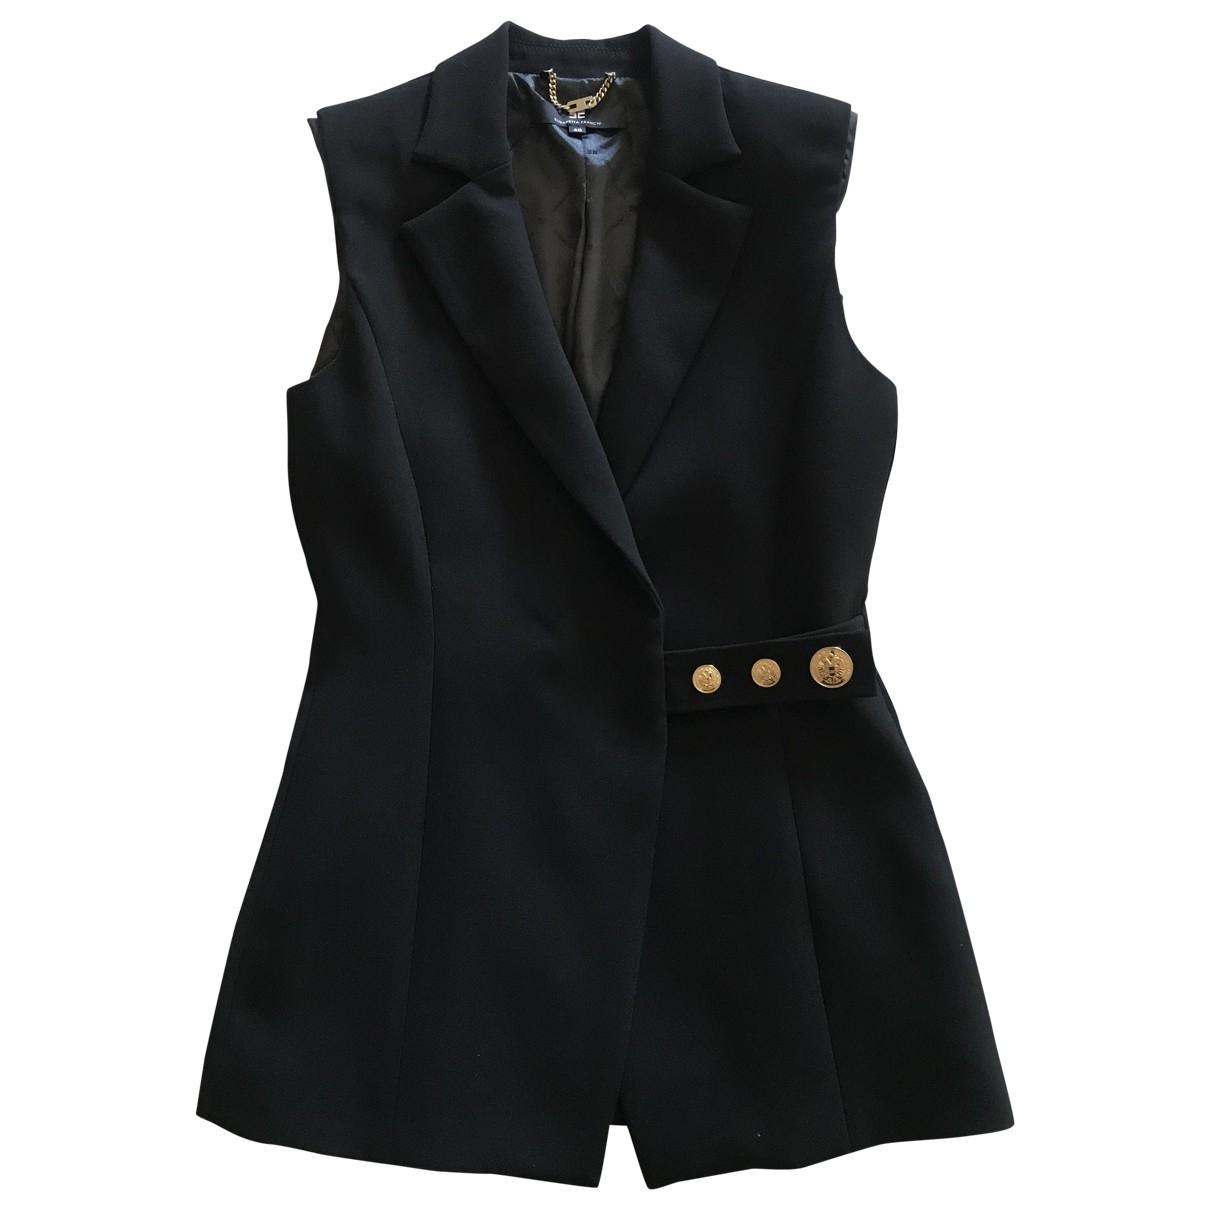 Elisabetta Franchi \N Black jacket for Women 40 IT